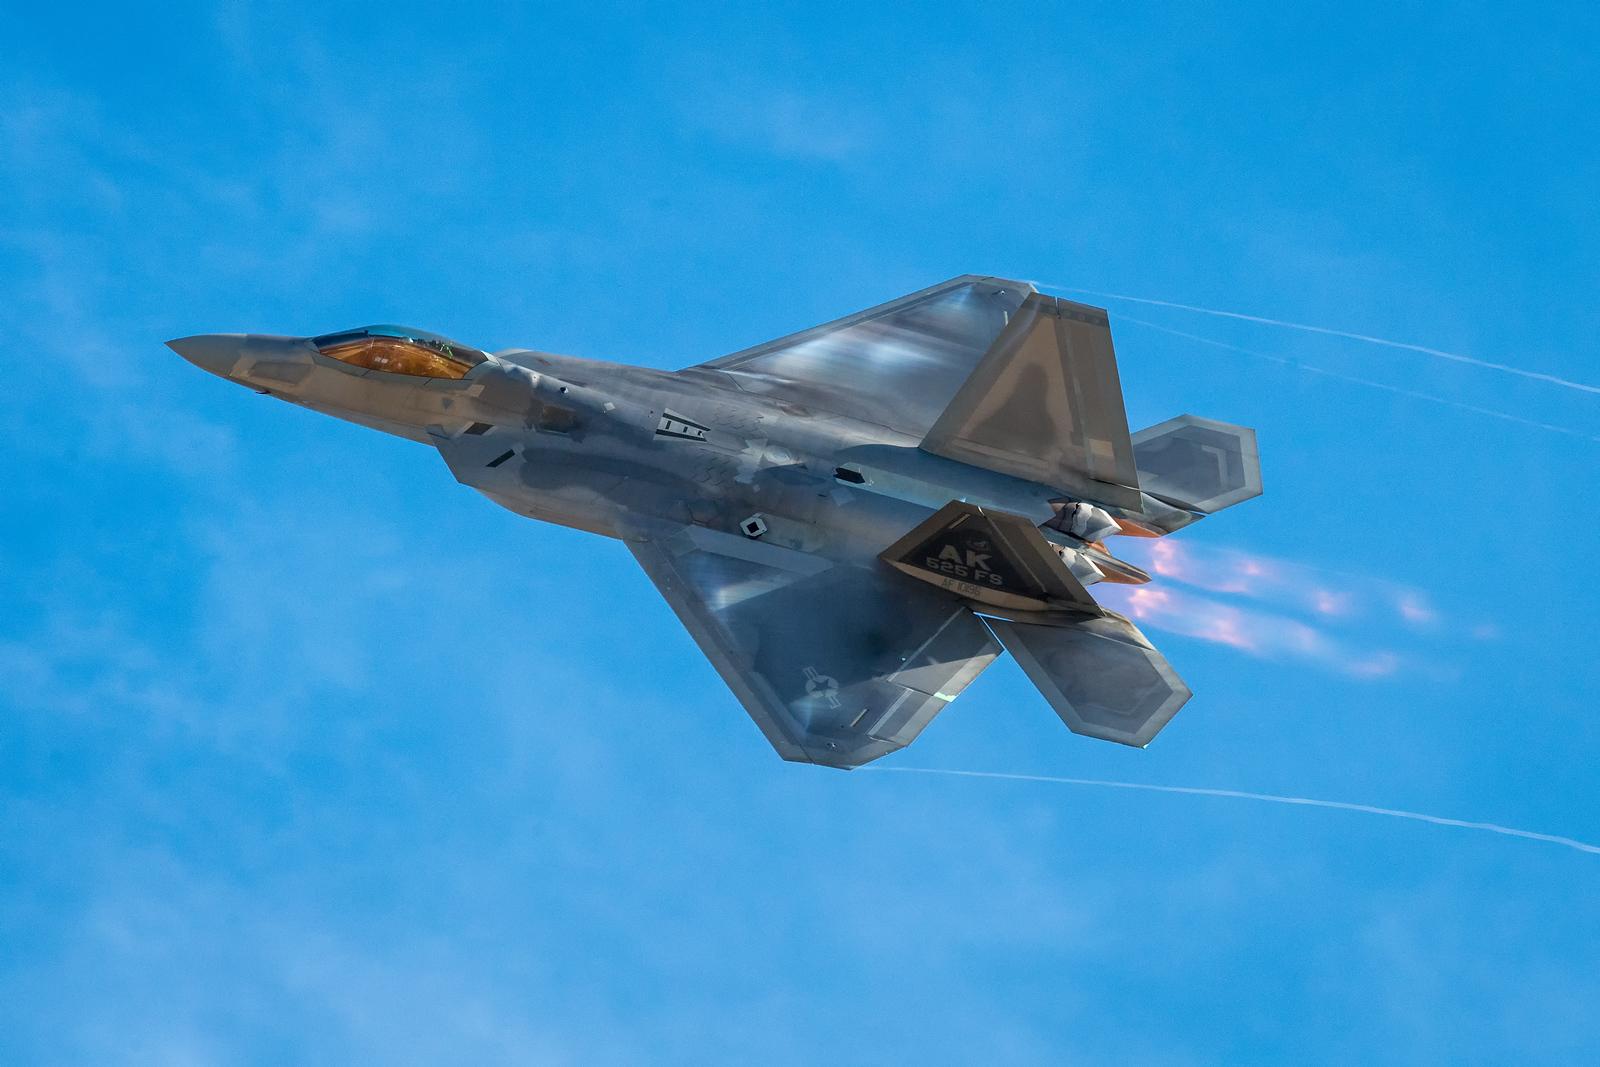 F-22 Raptor accelerating past the flight line